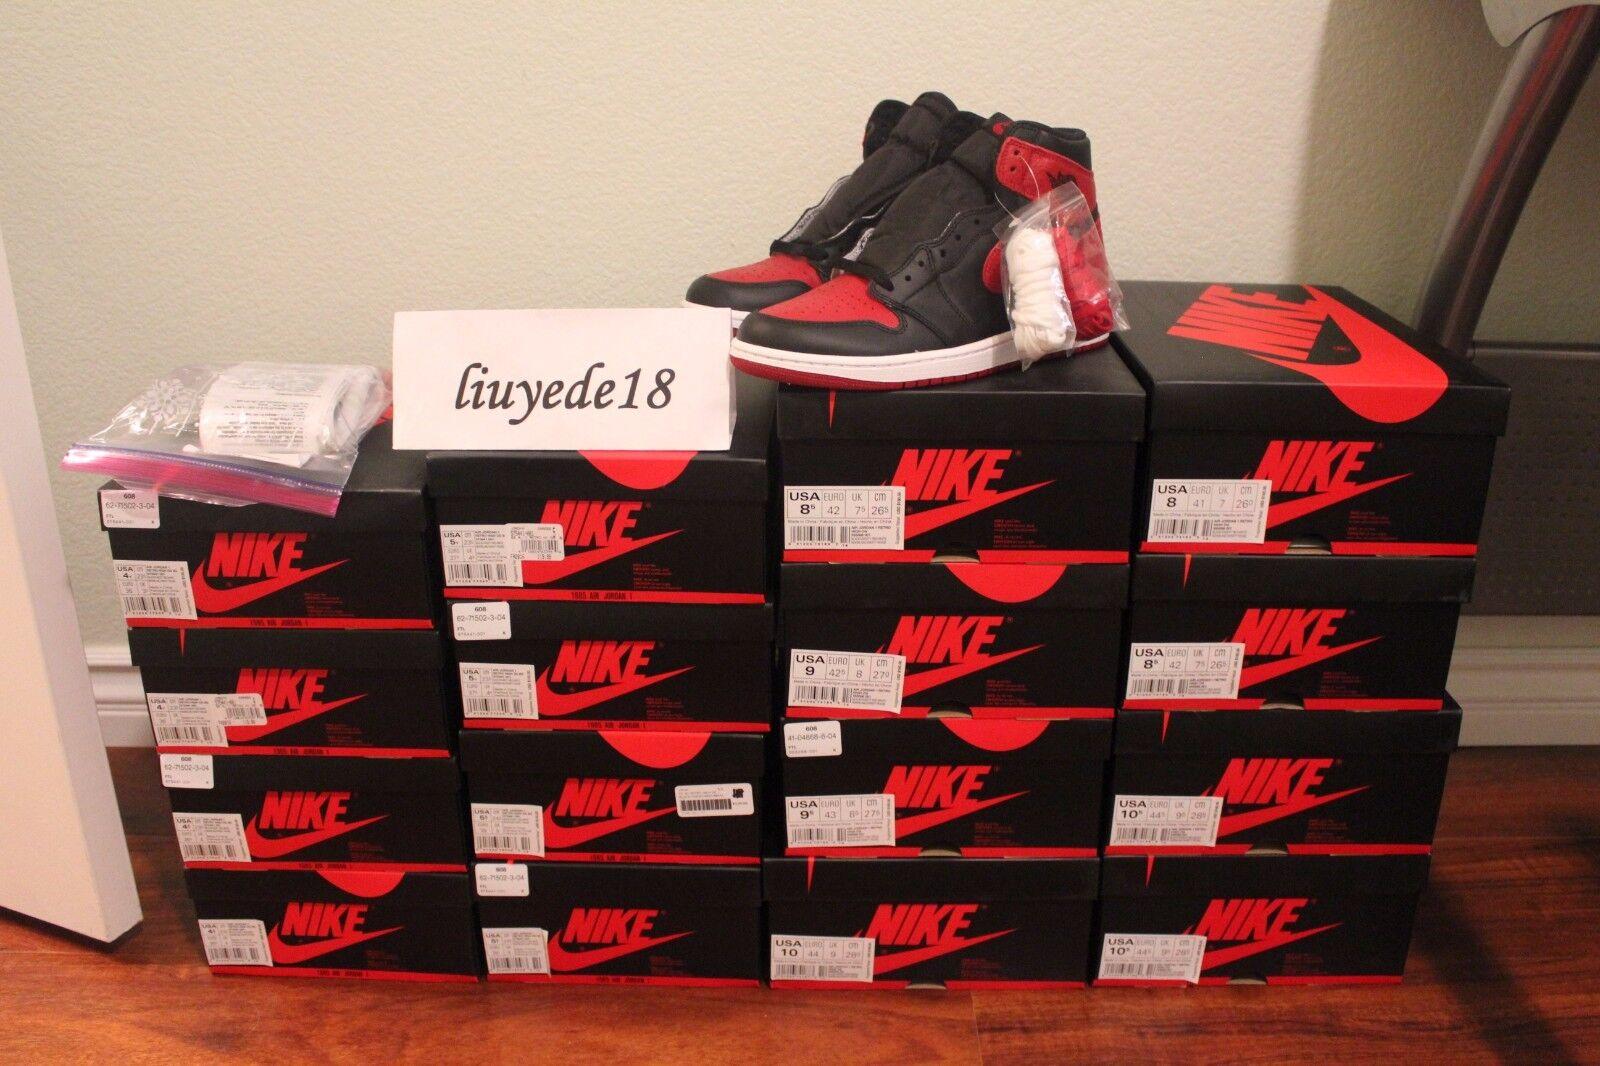 Air Jordan 1 Retro high og bred banned 2018 black red royal blue chicago receipt